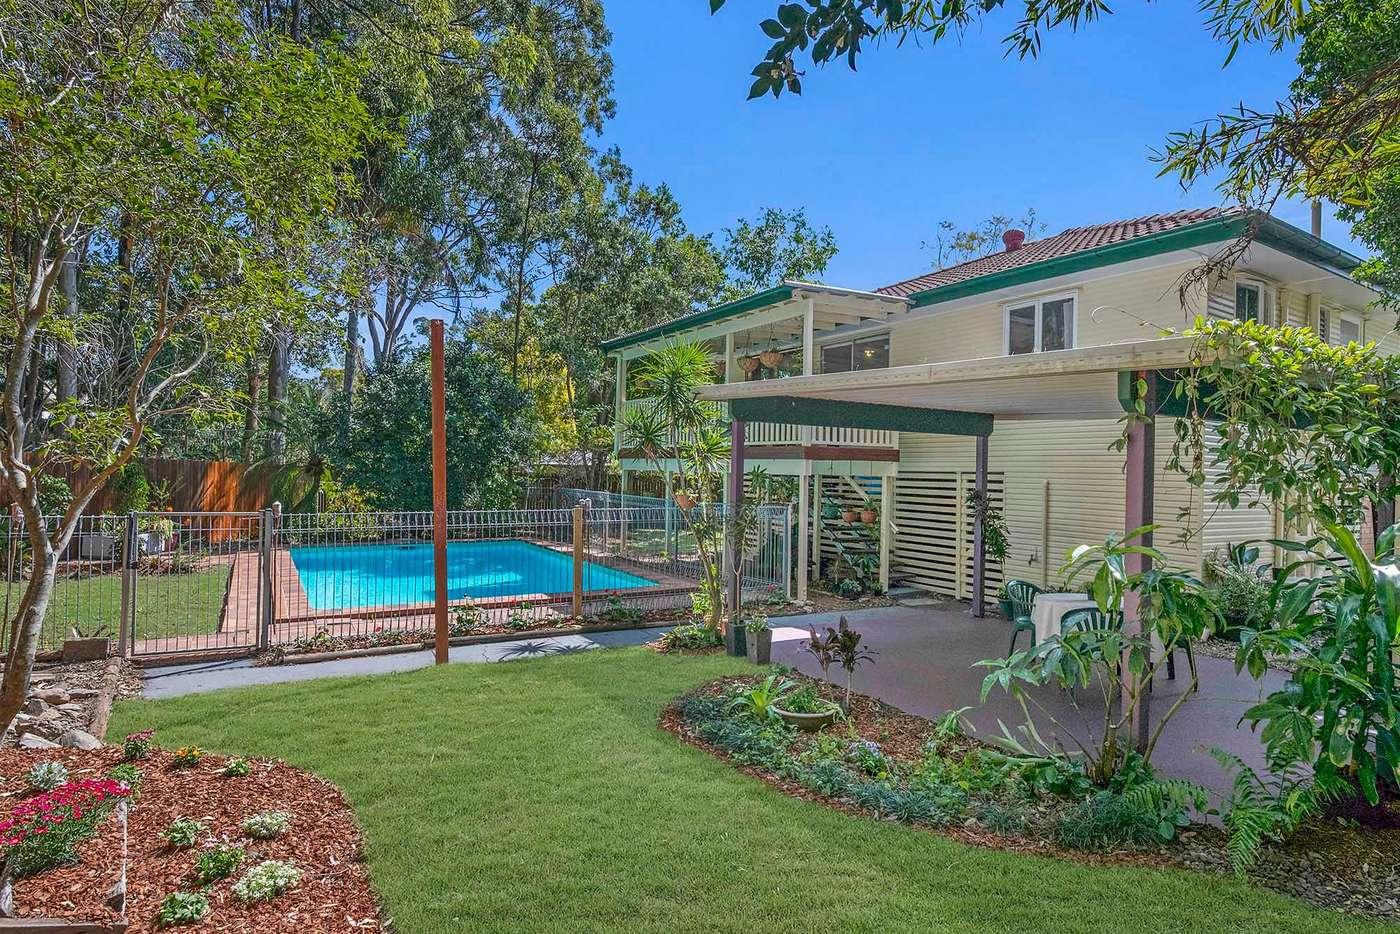 Main view of Homely house listing, 42 Verbena Street, Mount Gravatt QLD 4122